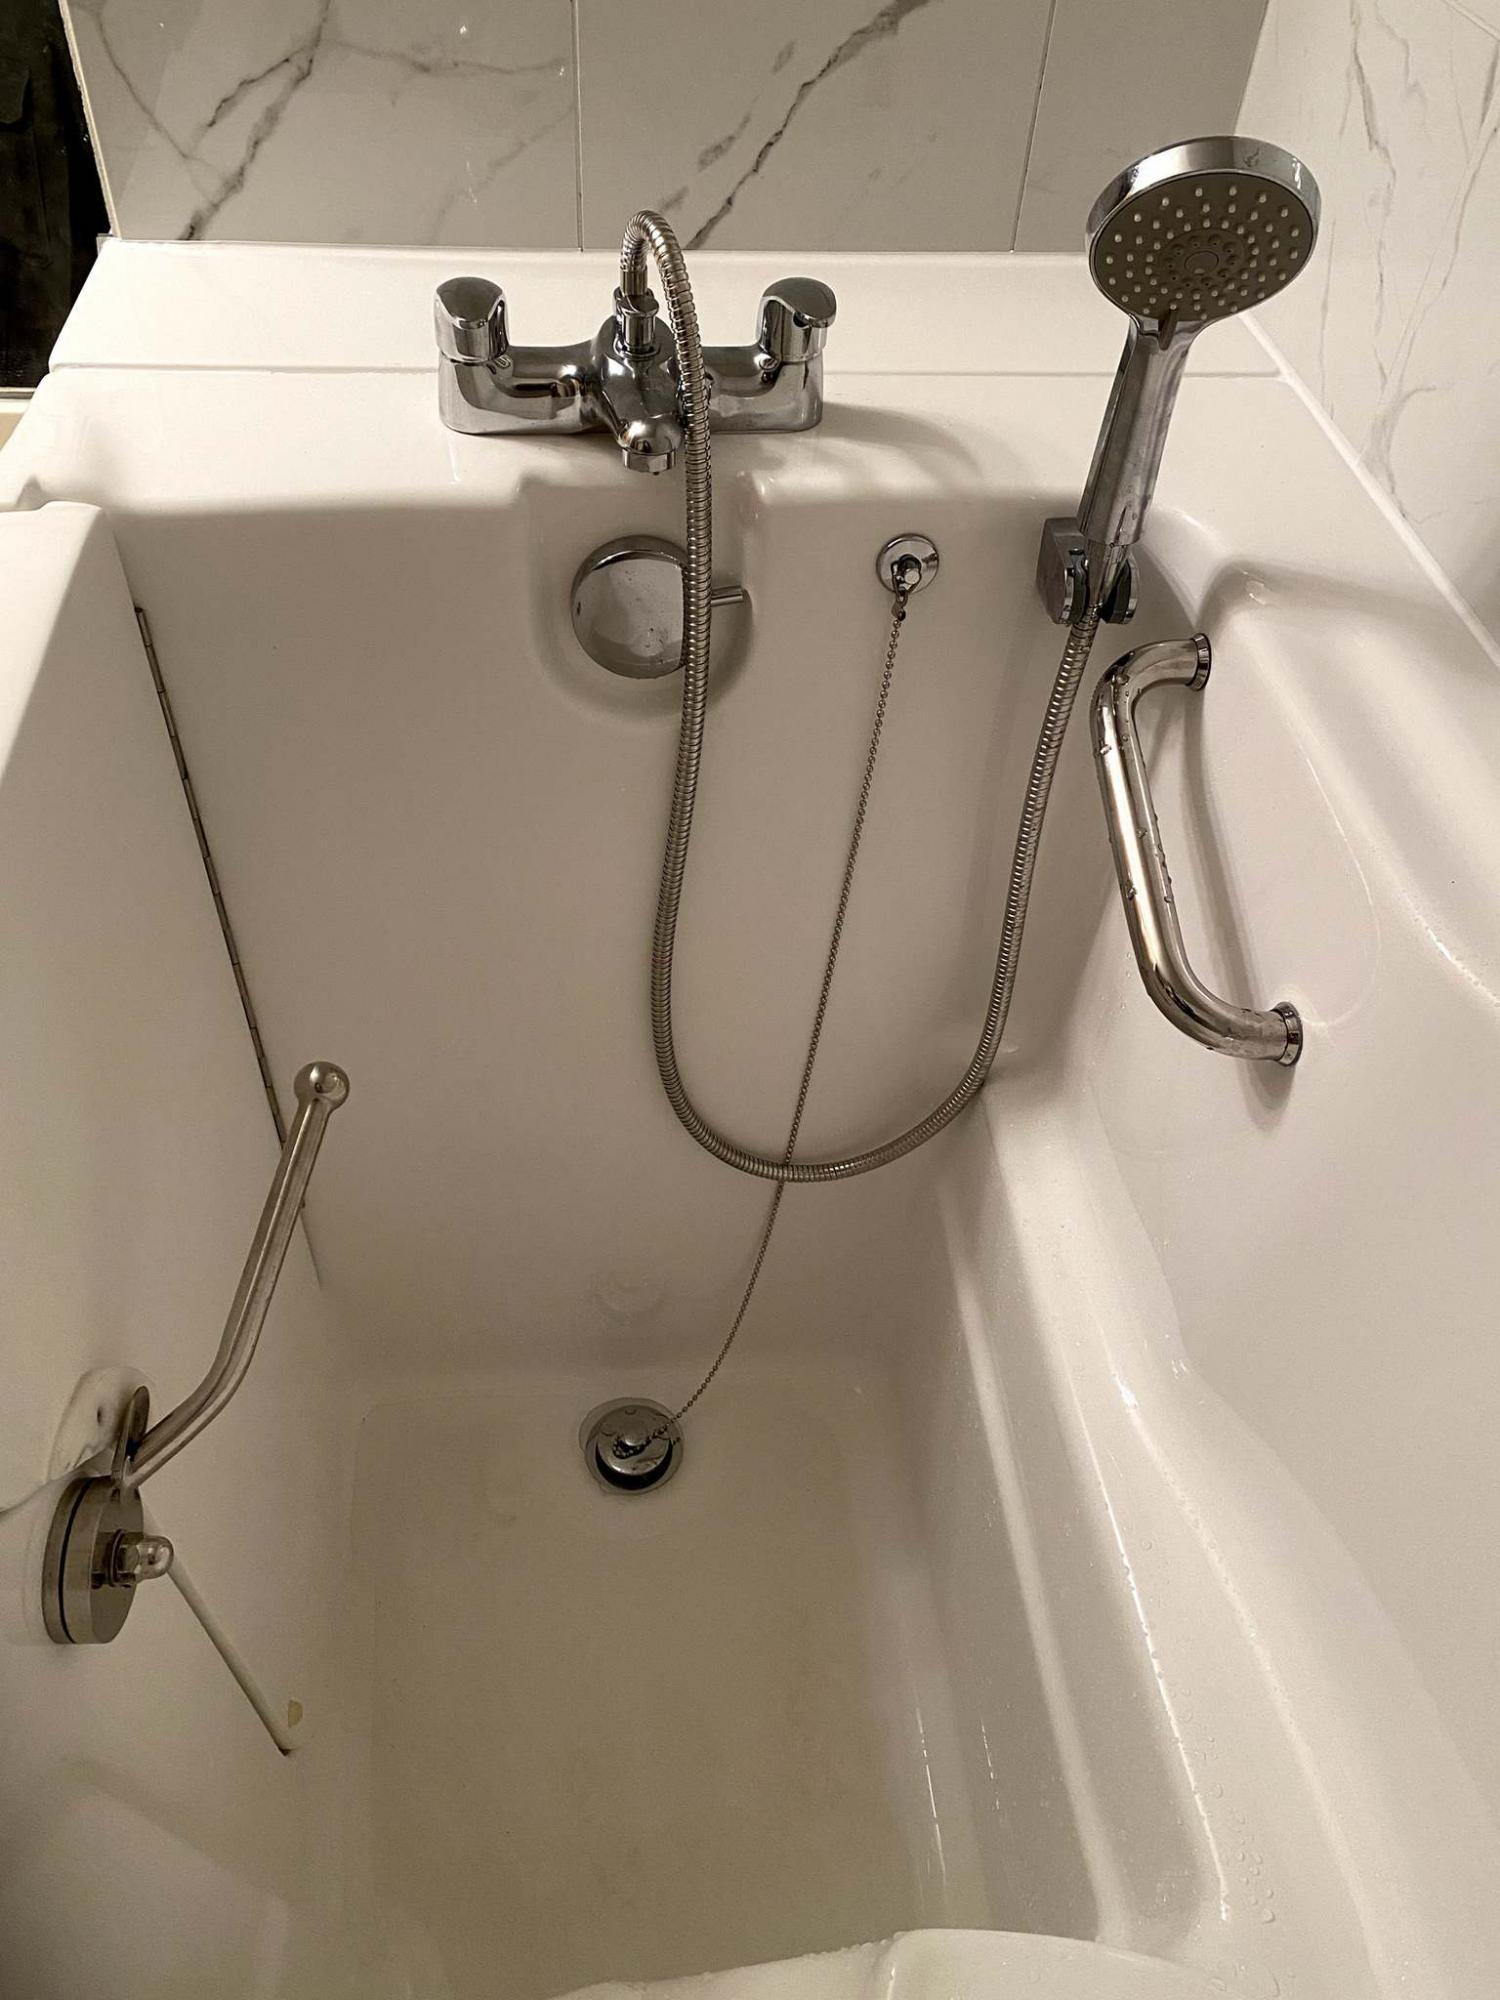 tub full of delays winnipeg free